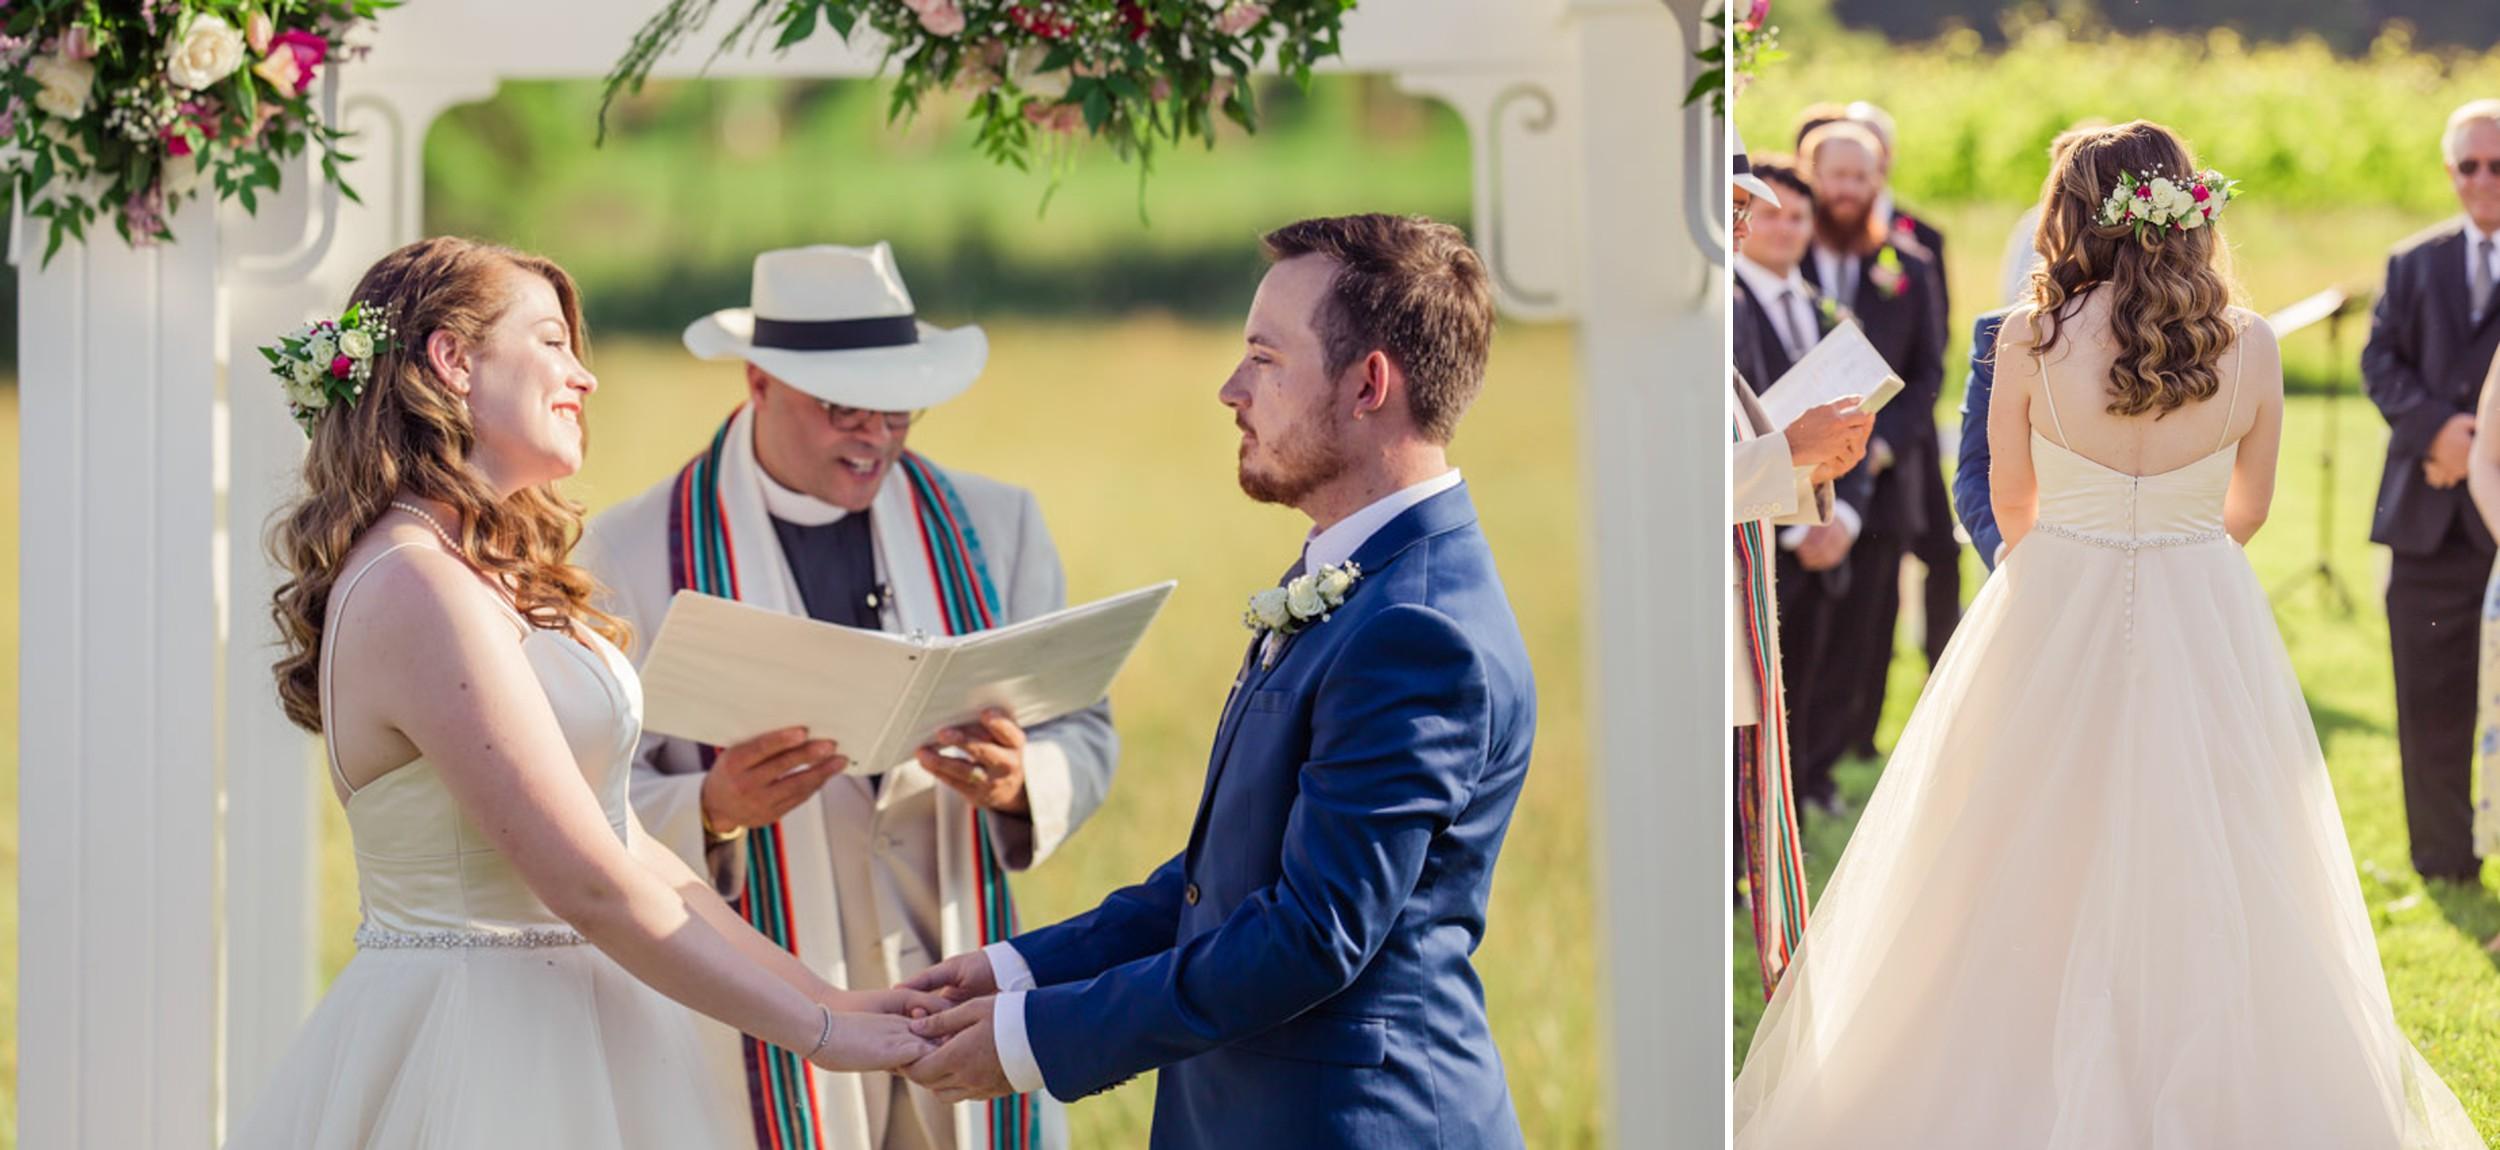 8 Chains North Wedding Ceremony